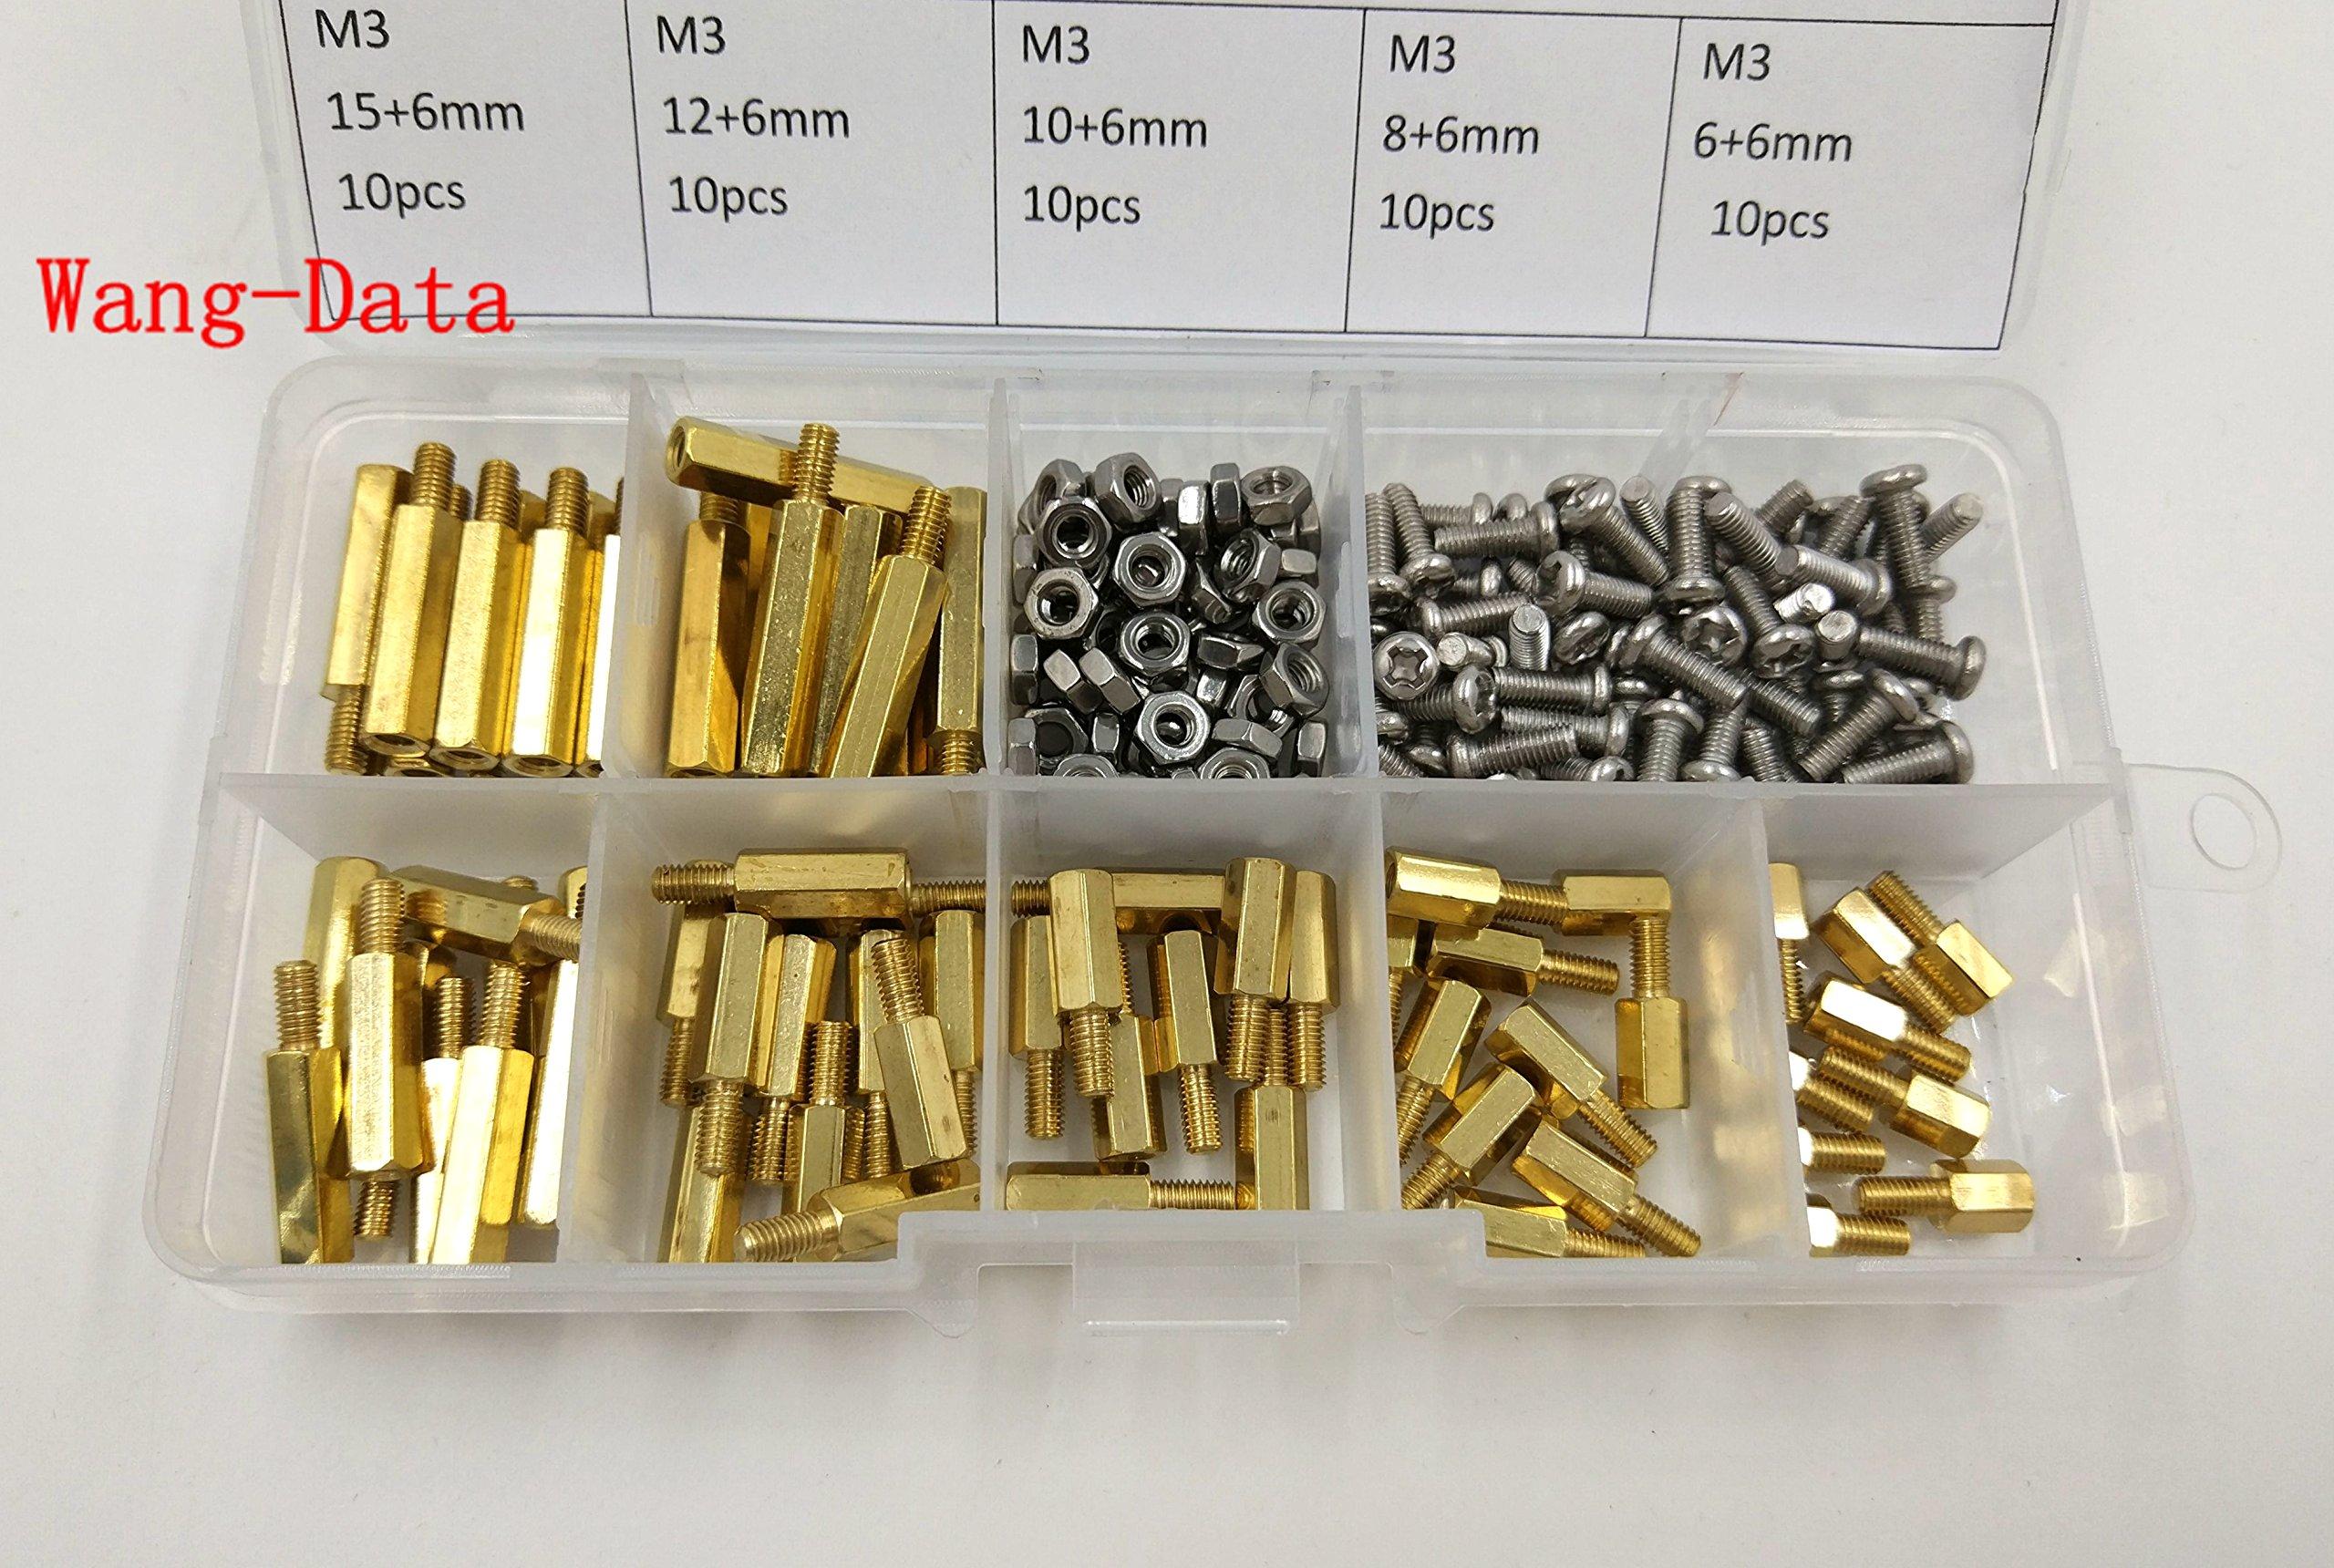 Wang-Data 210pcs M3 Male Female Brass Spacer Standoff/Stainless Steel Screw/Nut Assortment Kit